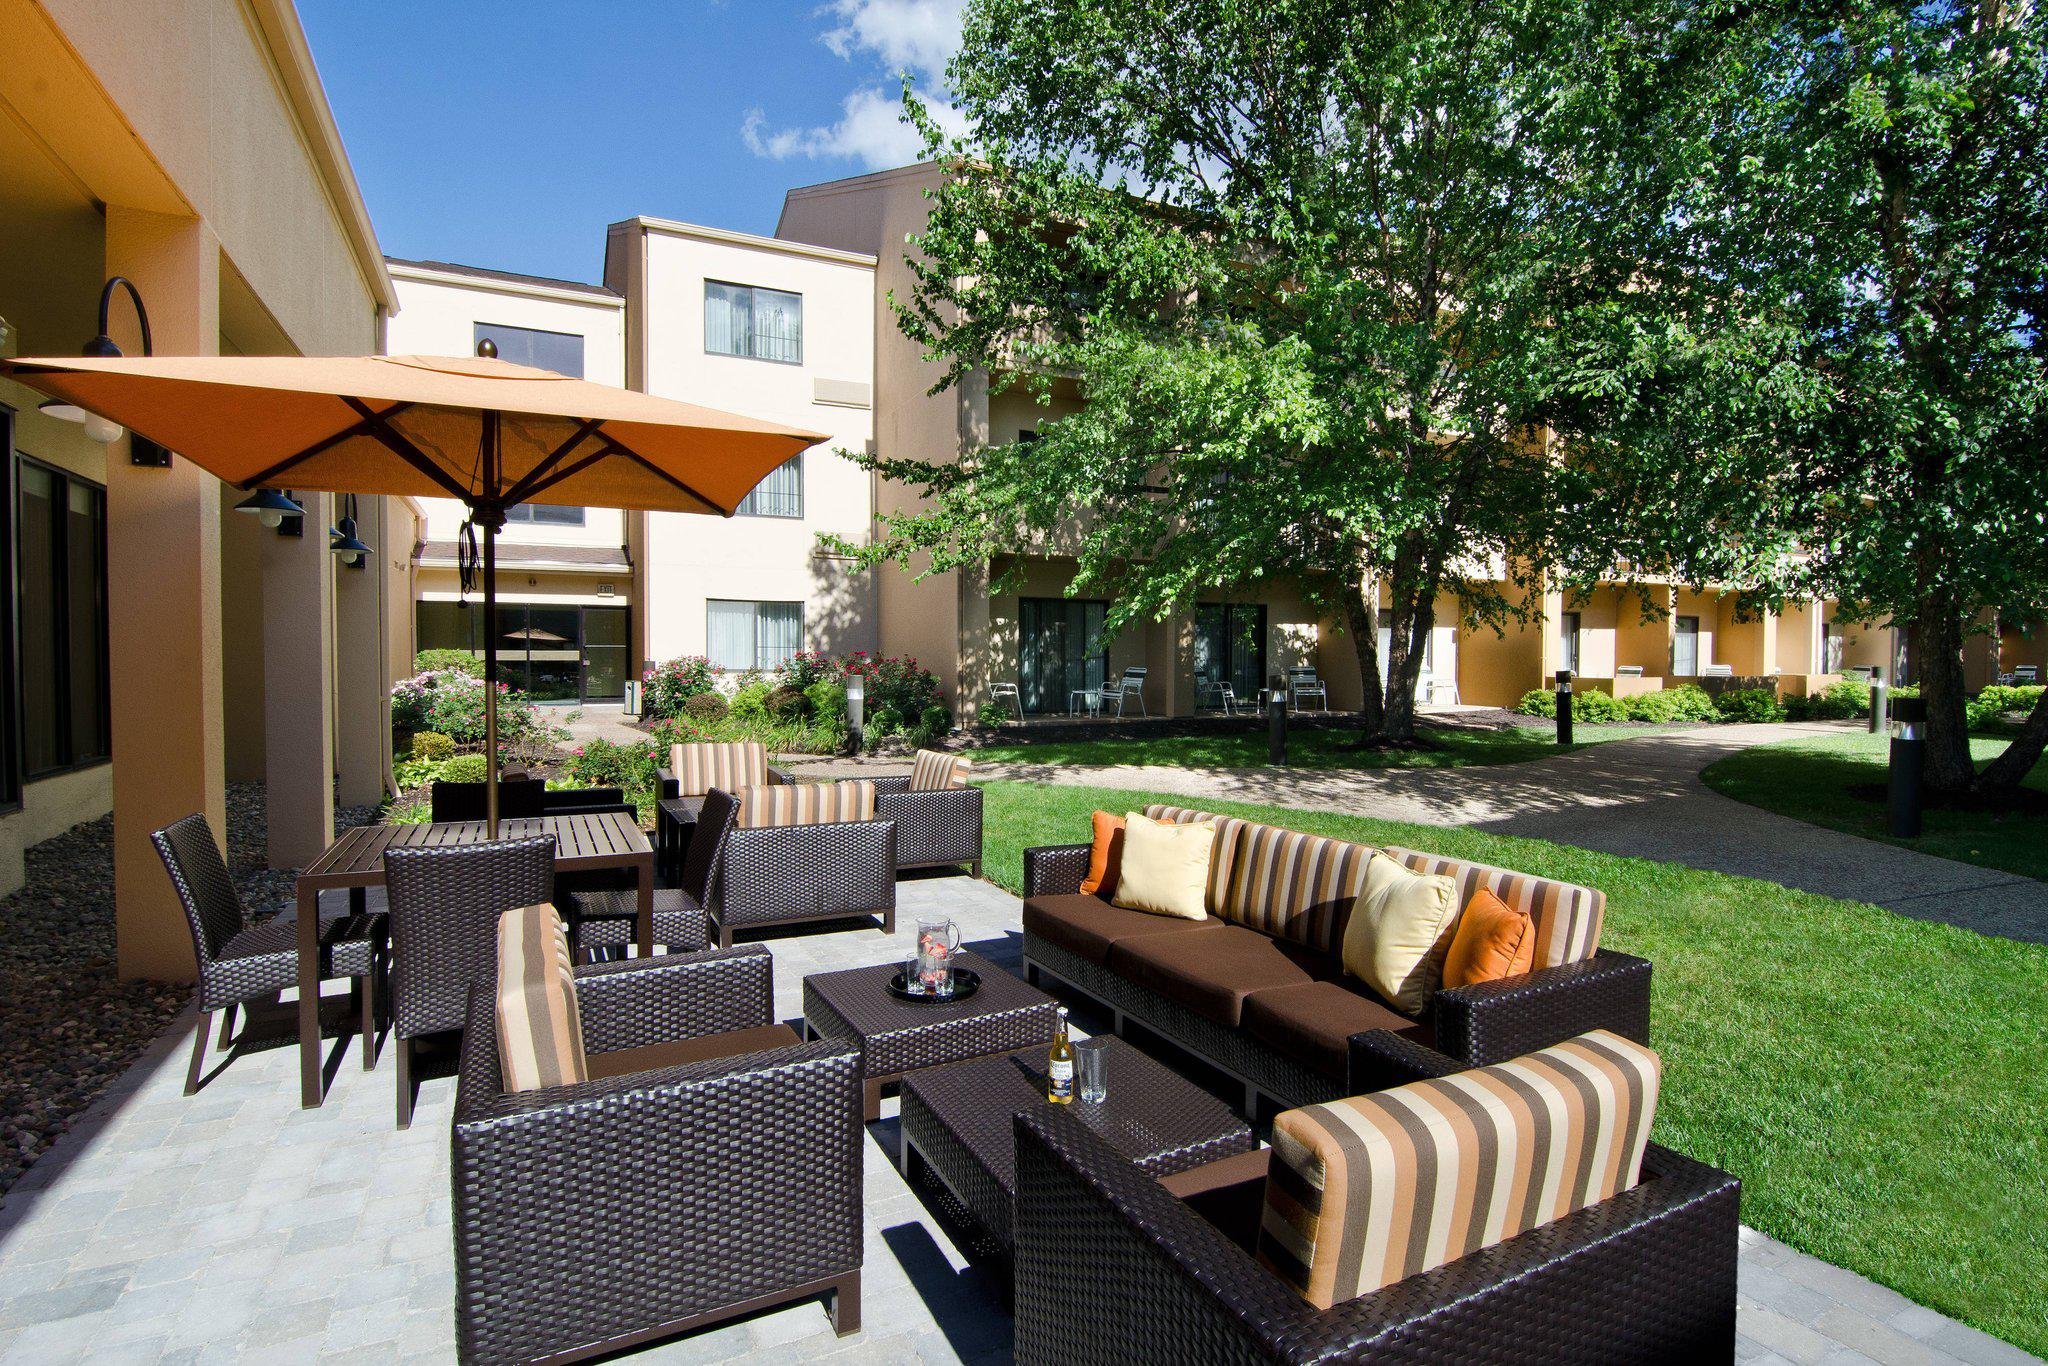 Courtyard by Marriott Kansas City Overland Park/Metcalf, South of College Boulevard